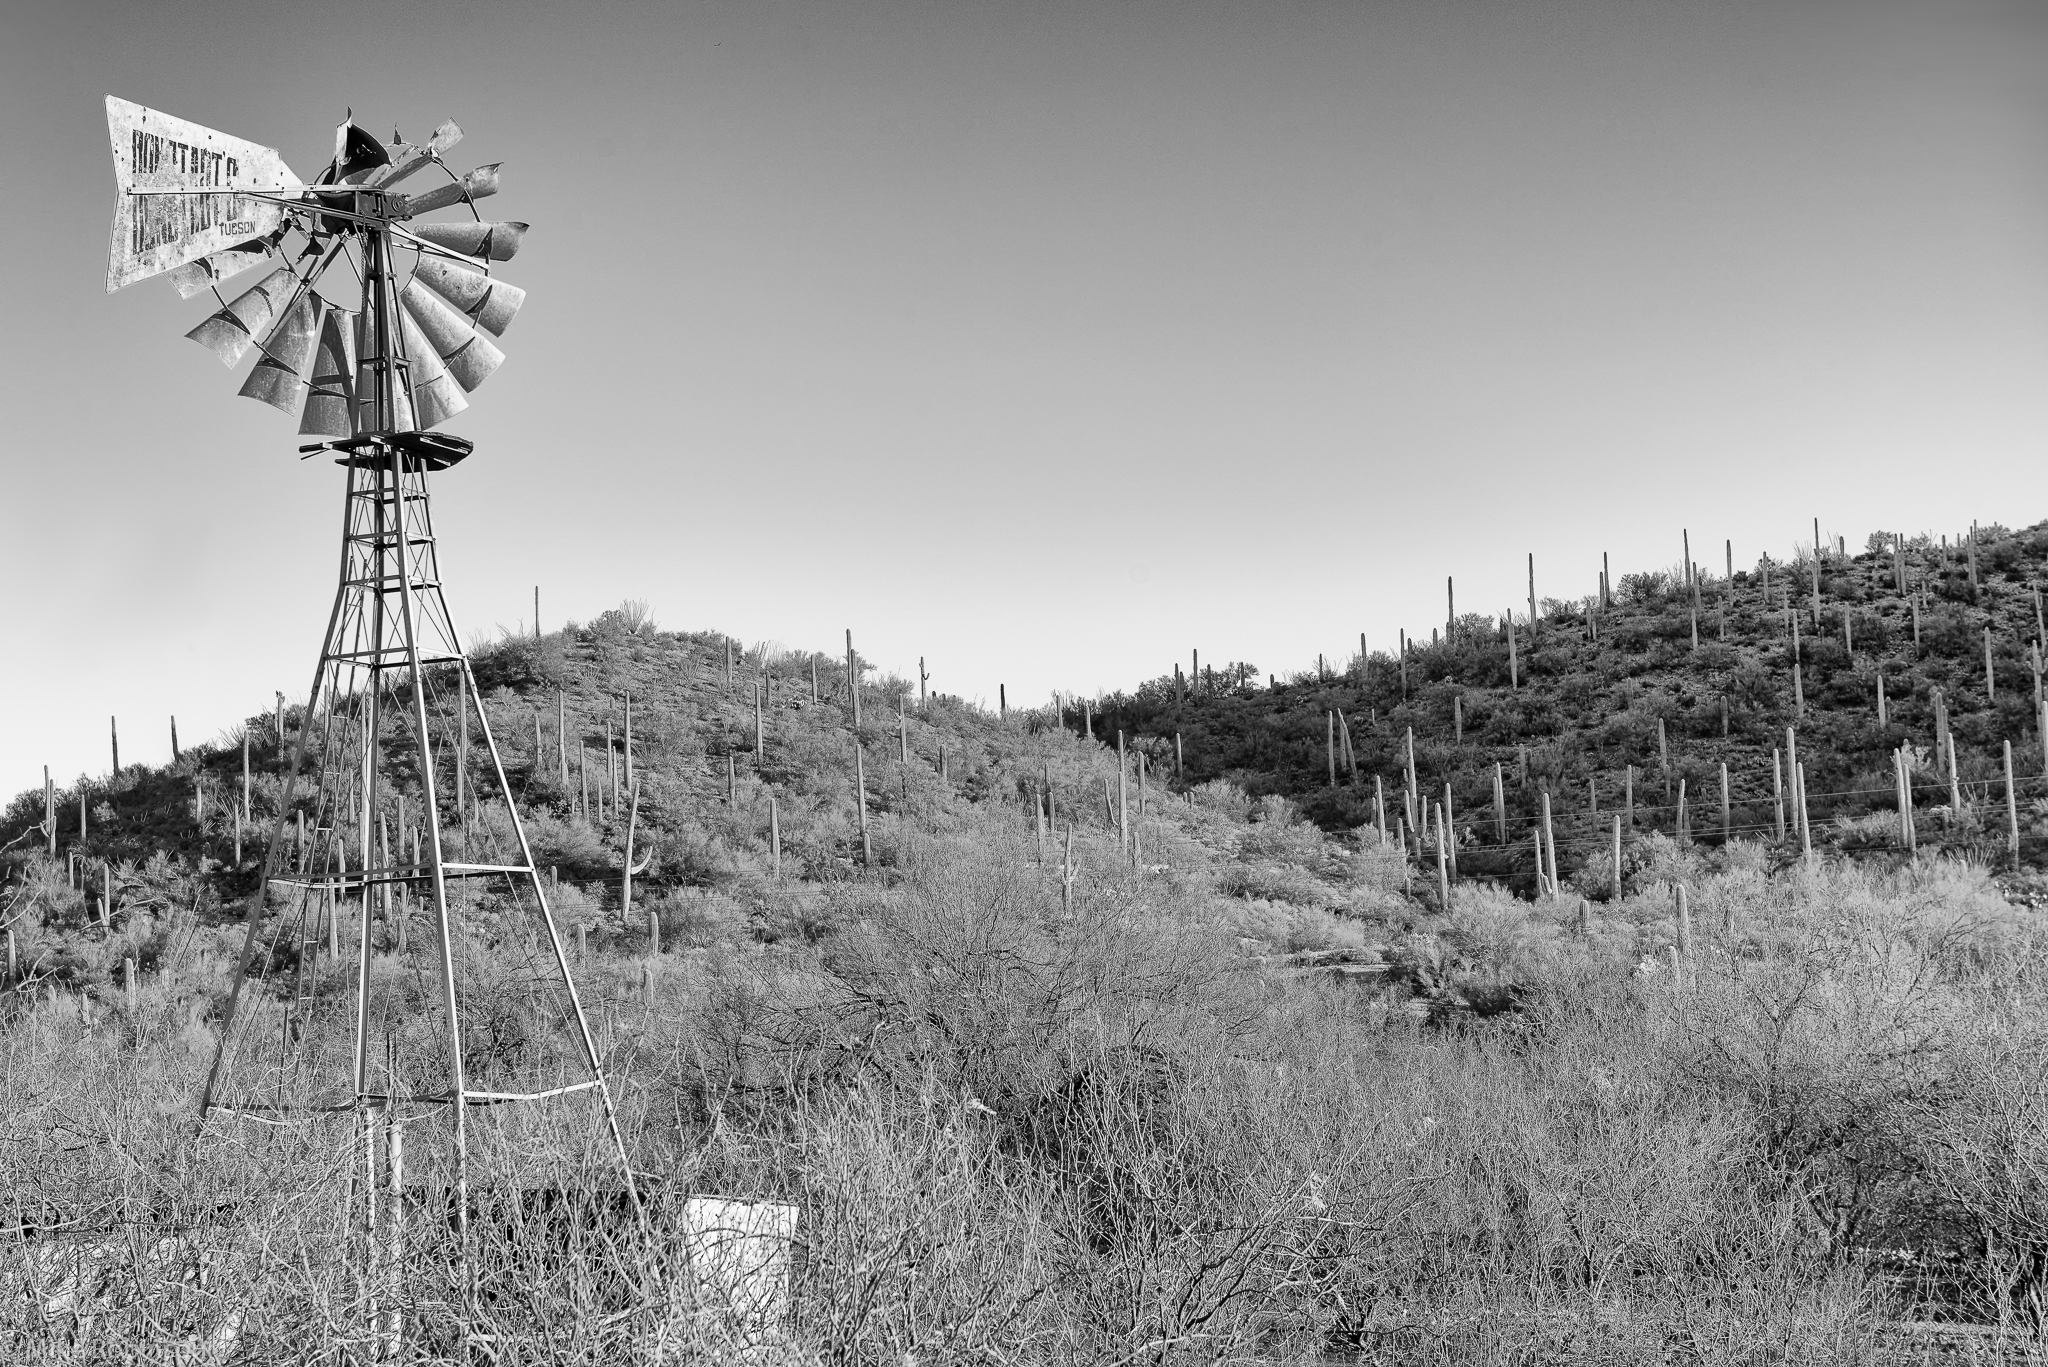 Southern_Arizona_Roadside_BW